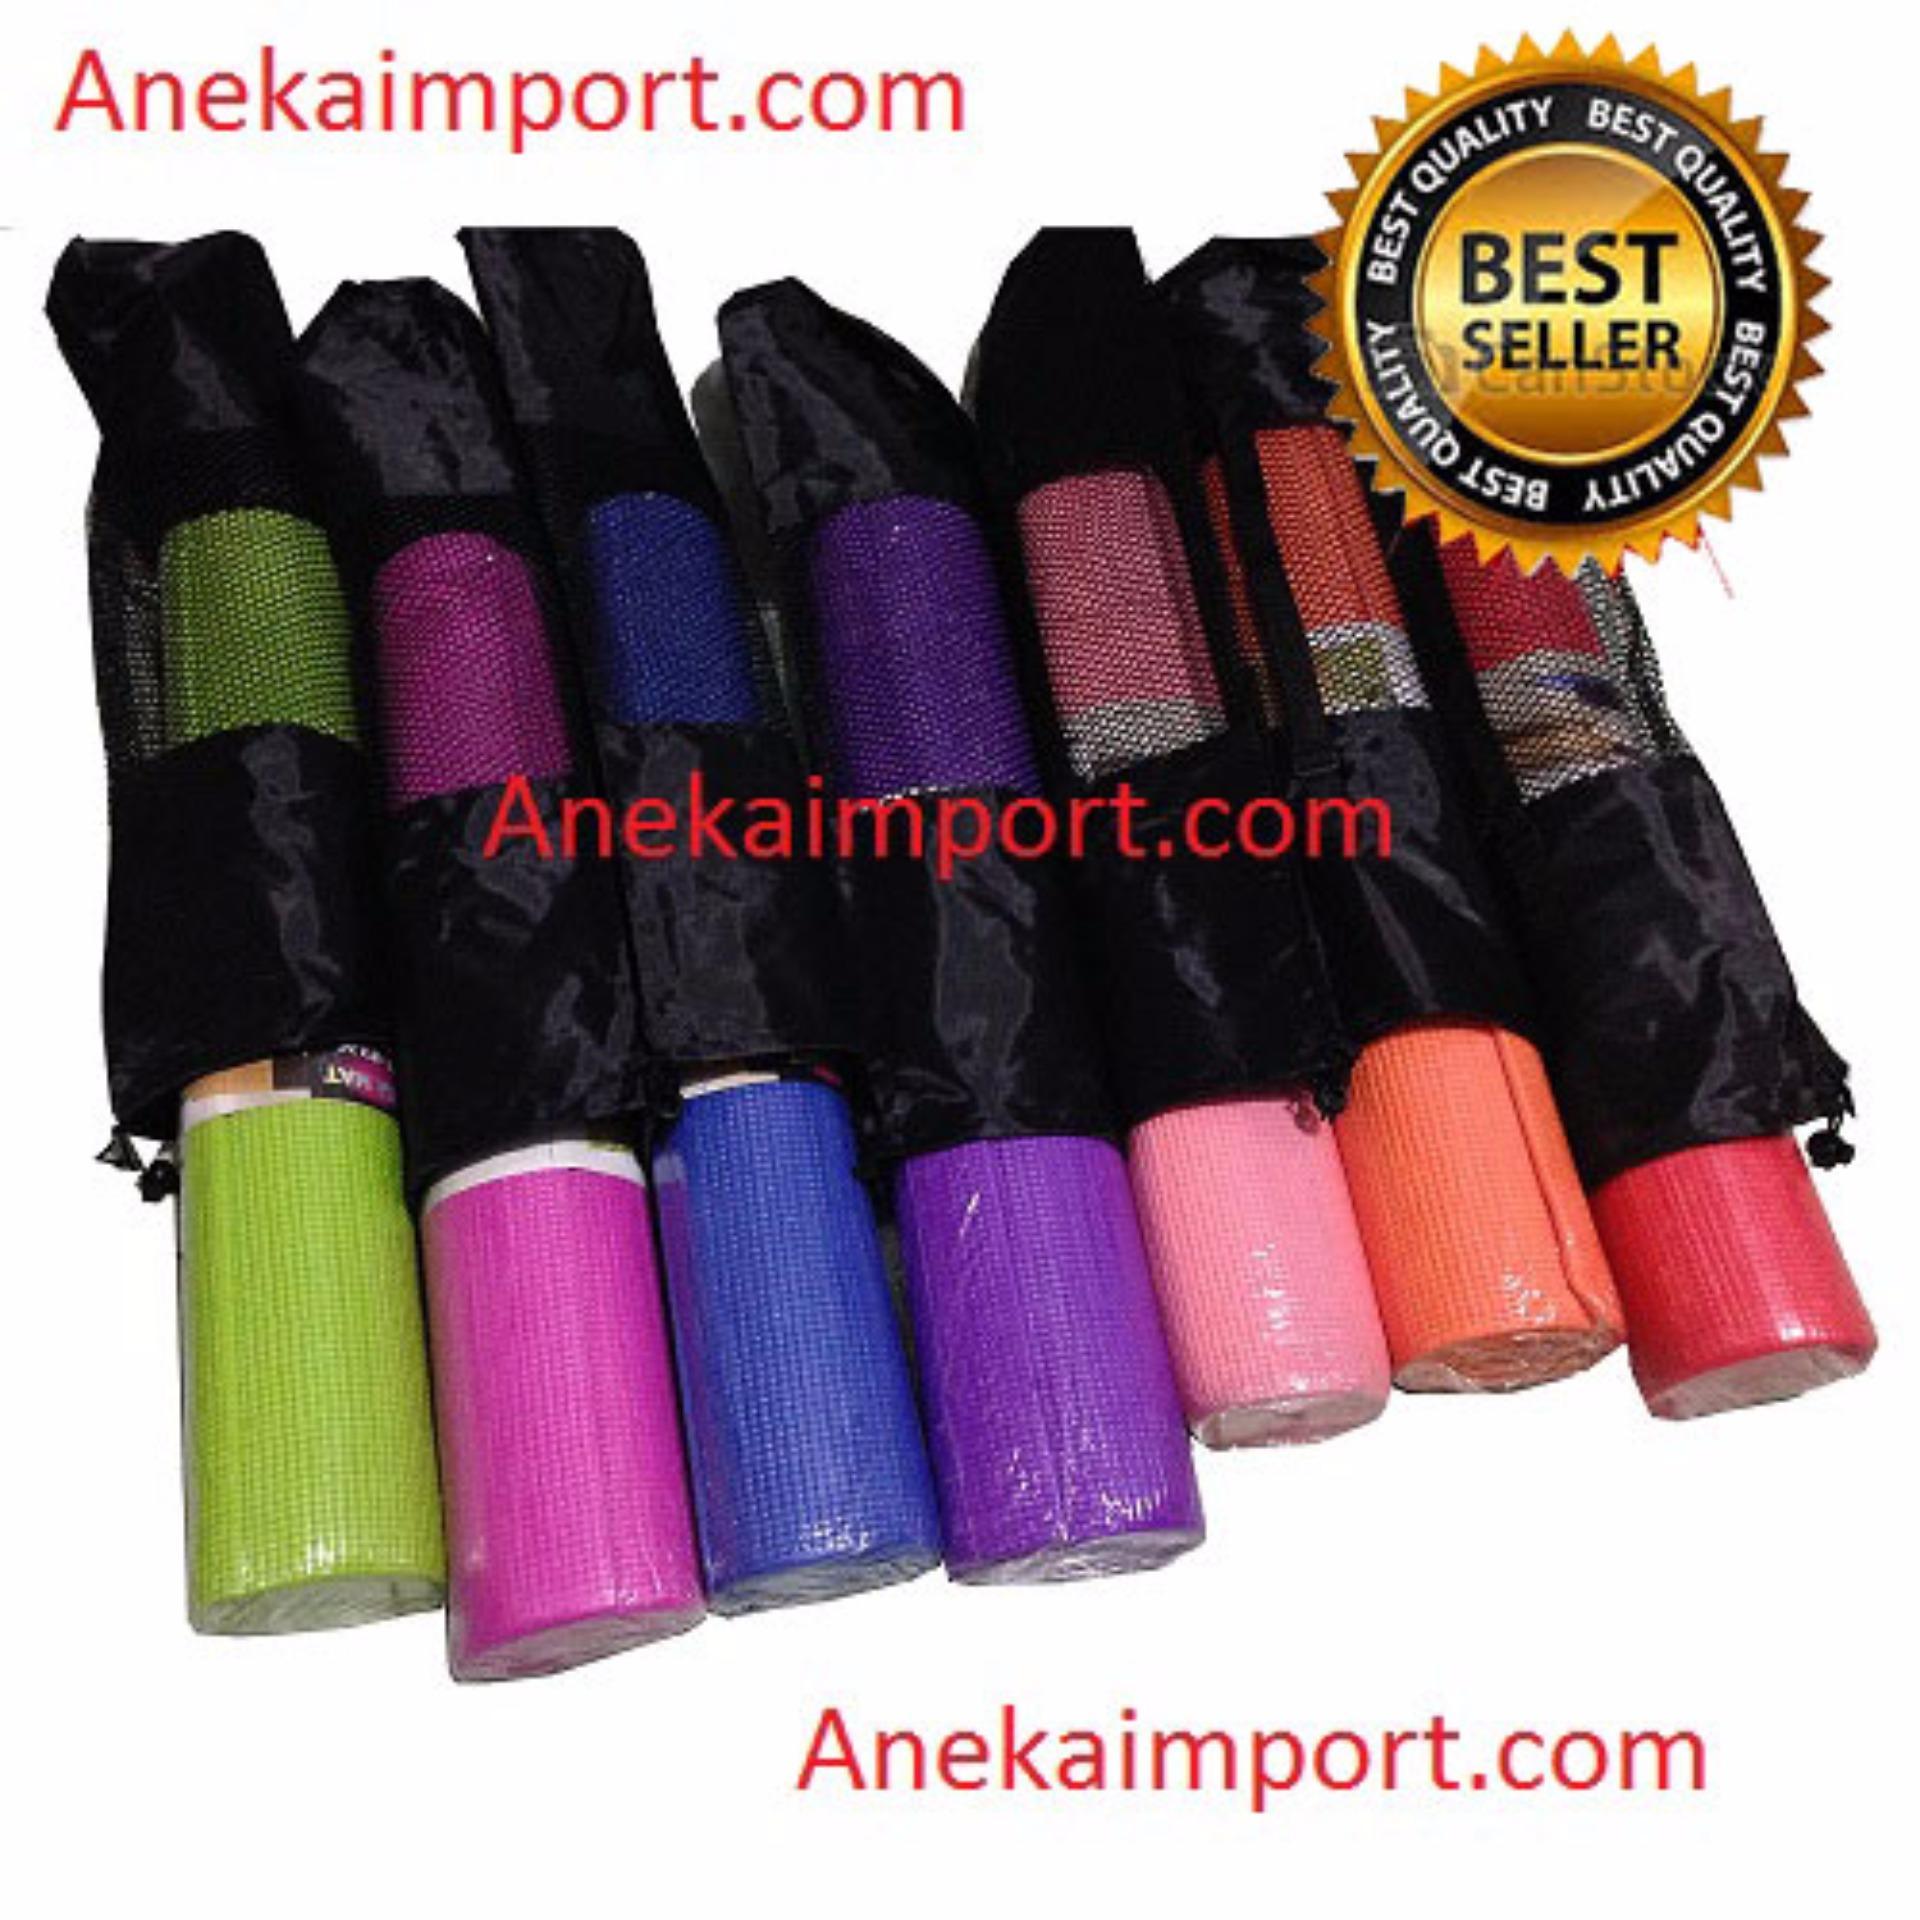 Harga Anekaimportdotcom Matras Yoga Yoga Mat Pilates Mat Pink Gratis Yoga Bag Origin